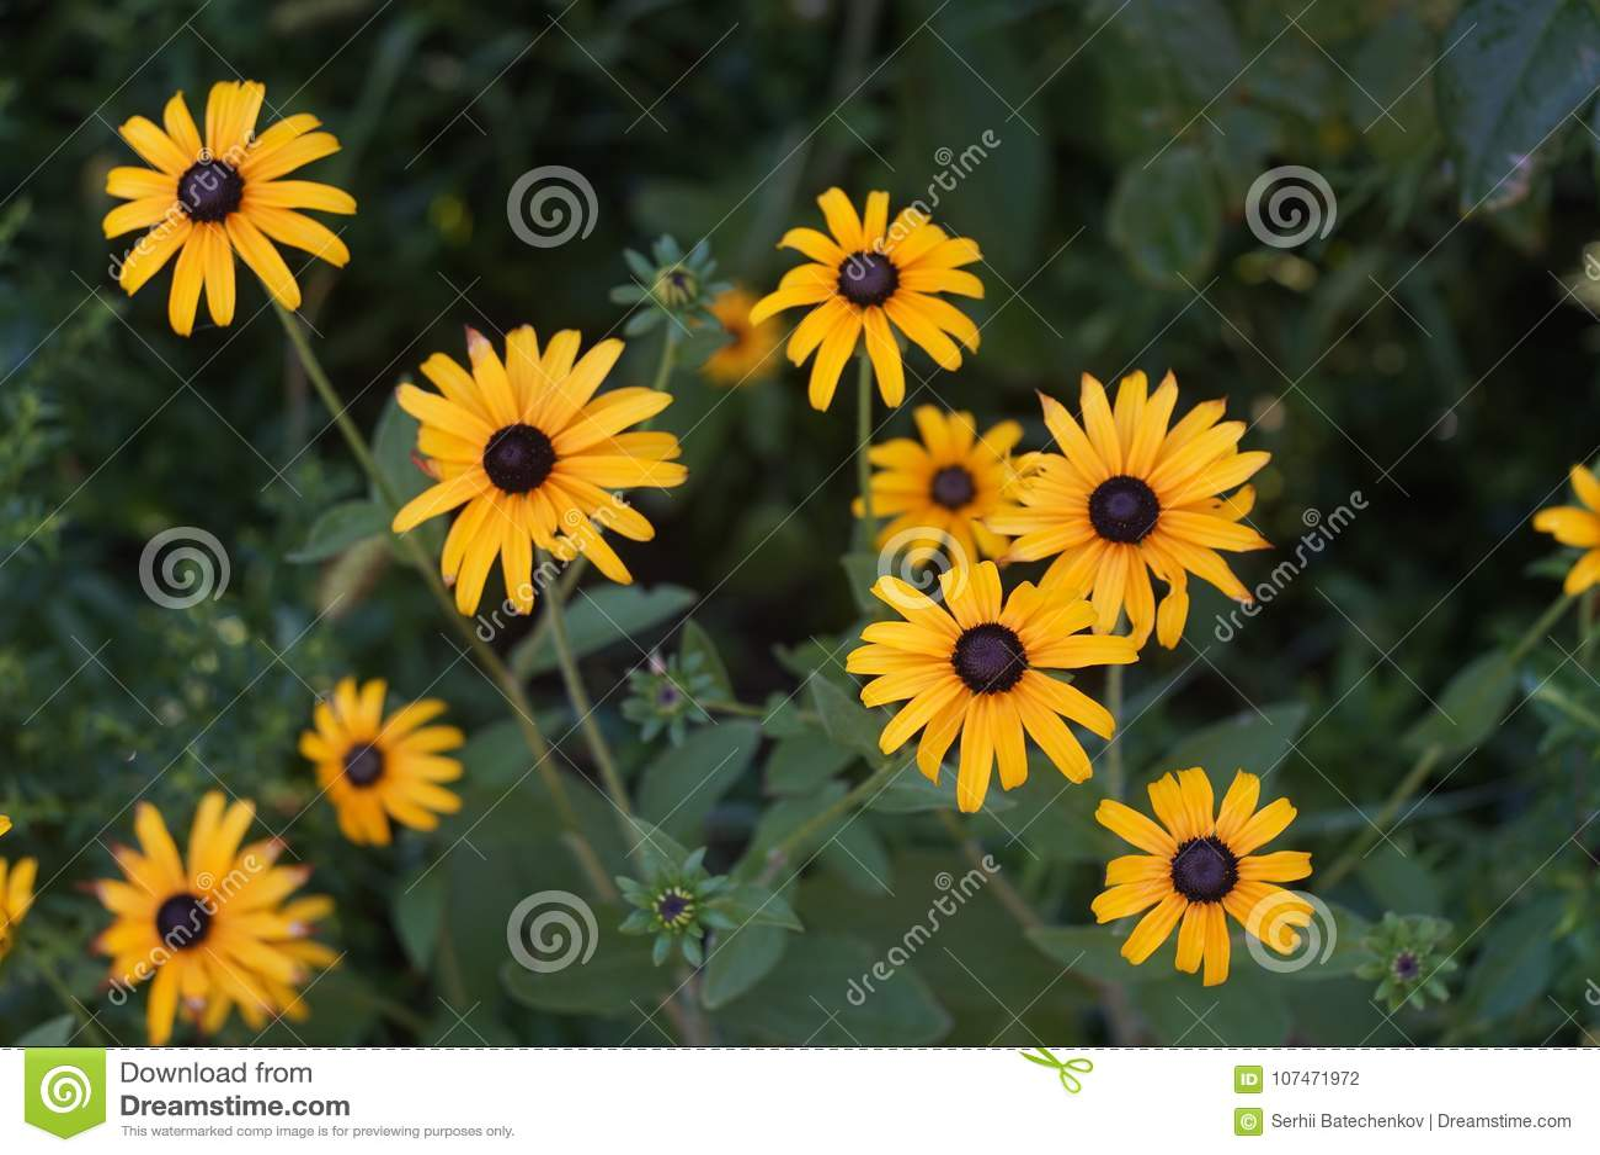 Flowers Rudbeckia Hirta Or Black Eyed Susan In The Green Garden